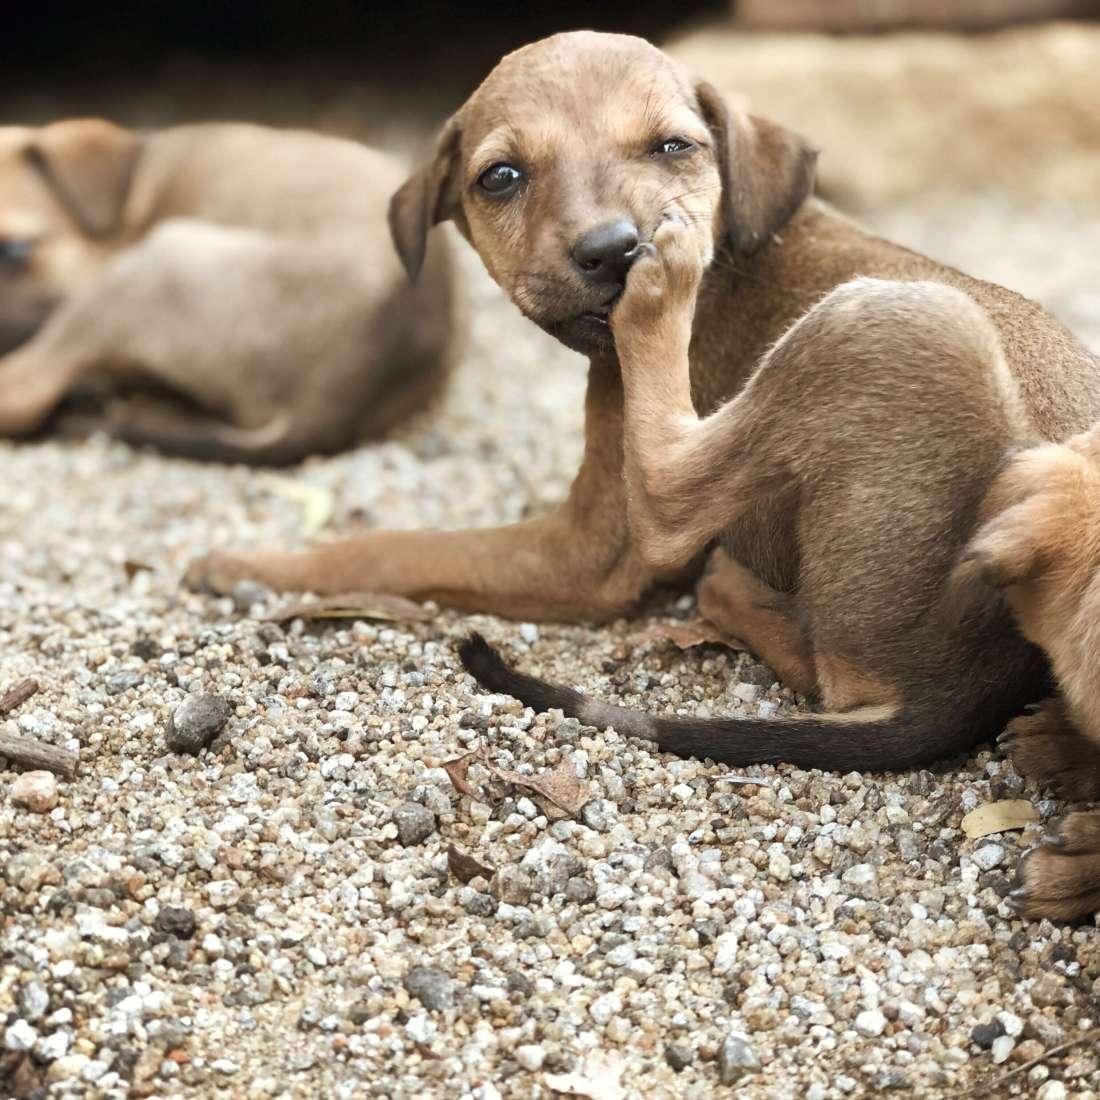 Puppies, Ambasamudram, South India